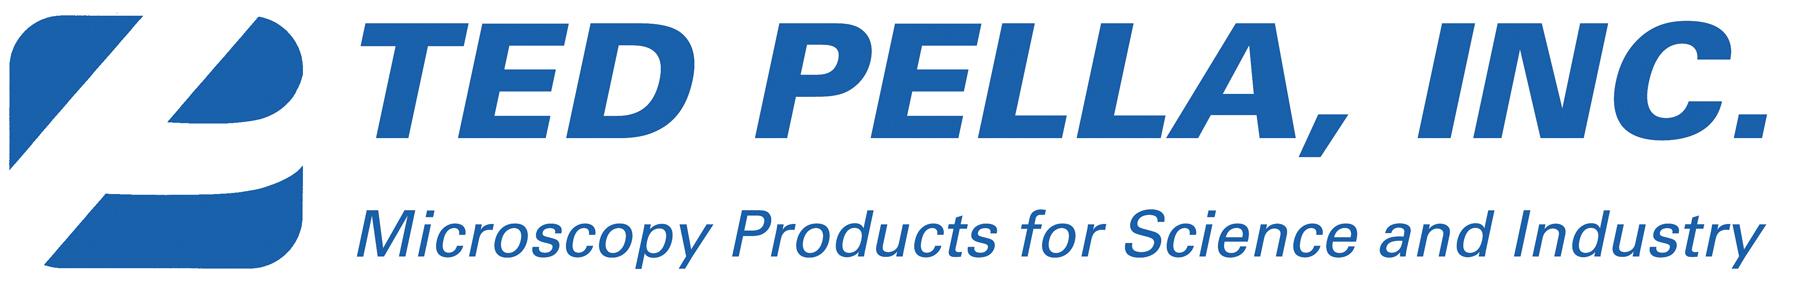 Ted Pella, Inc. logo.jpg